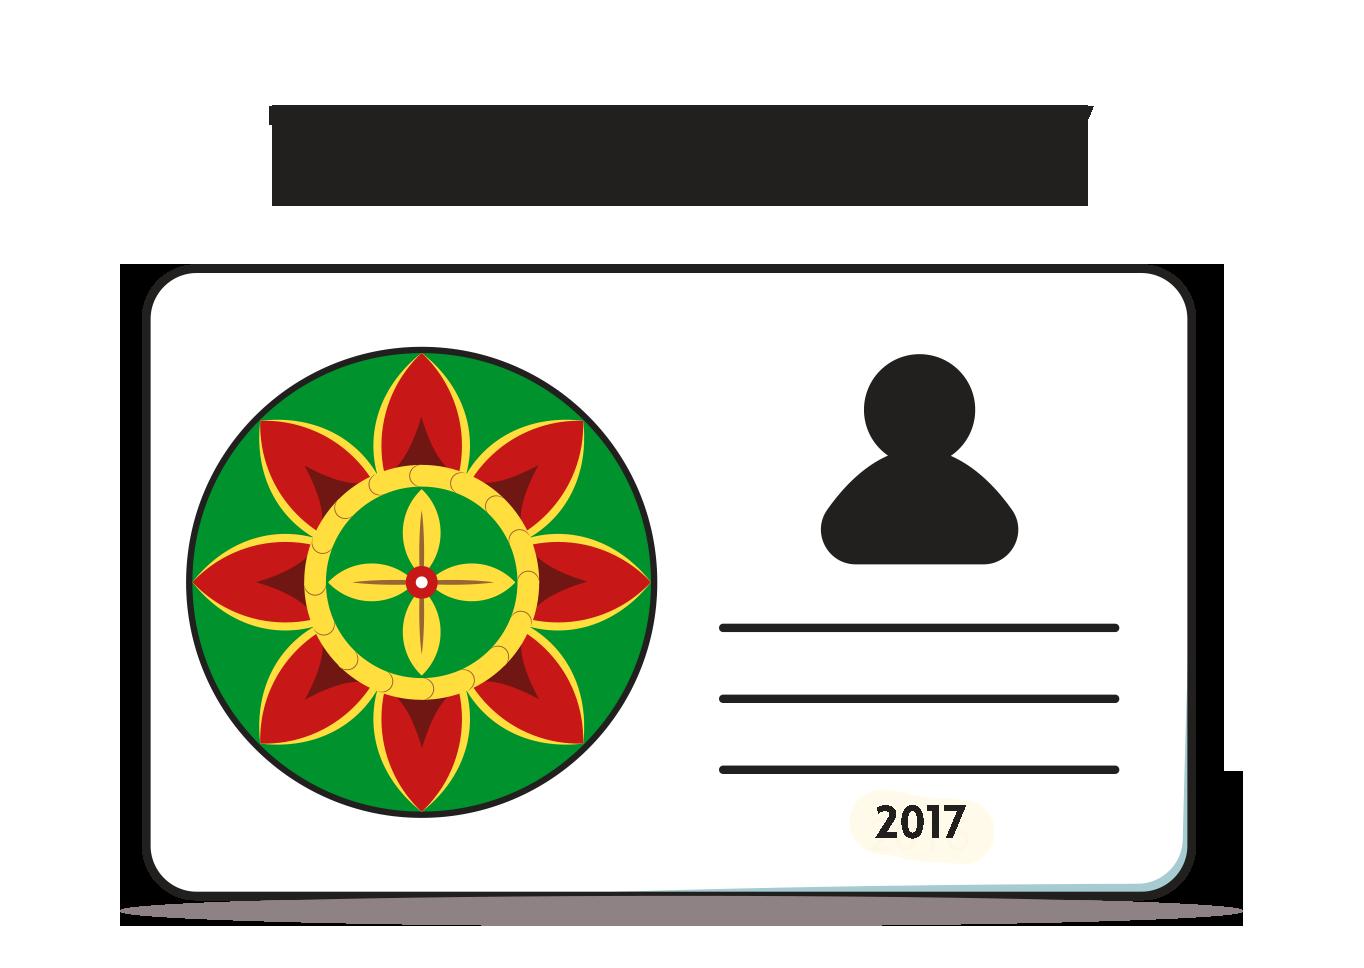 Tessere Soci 2017